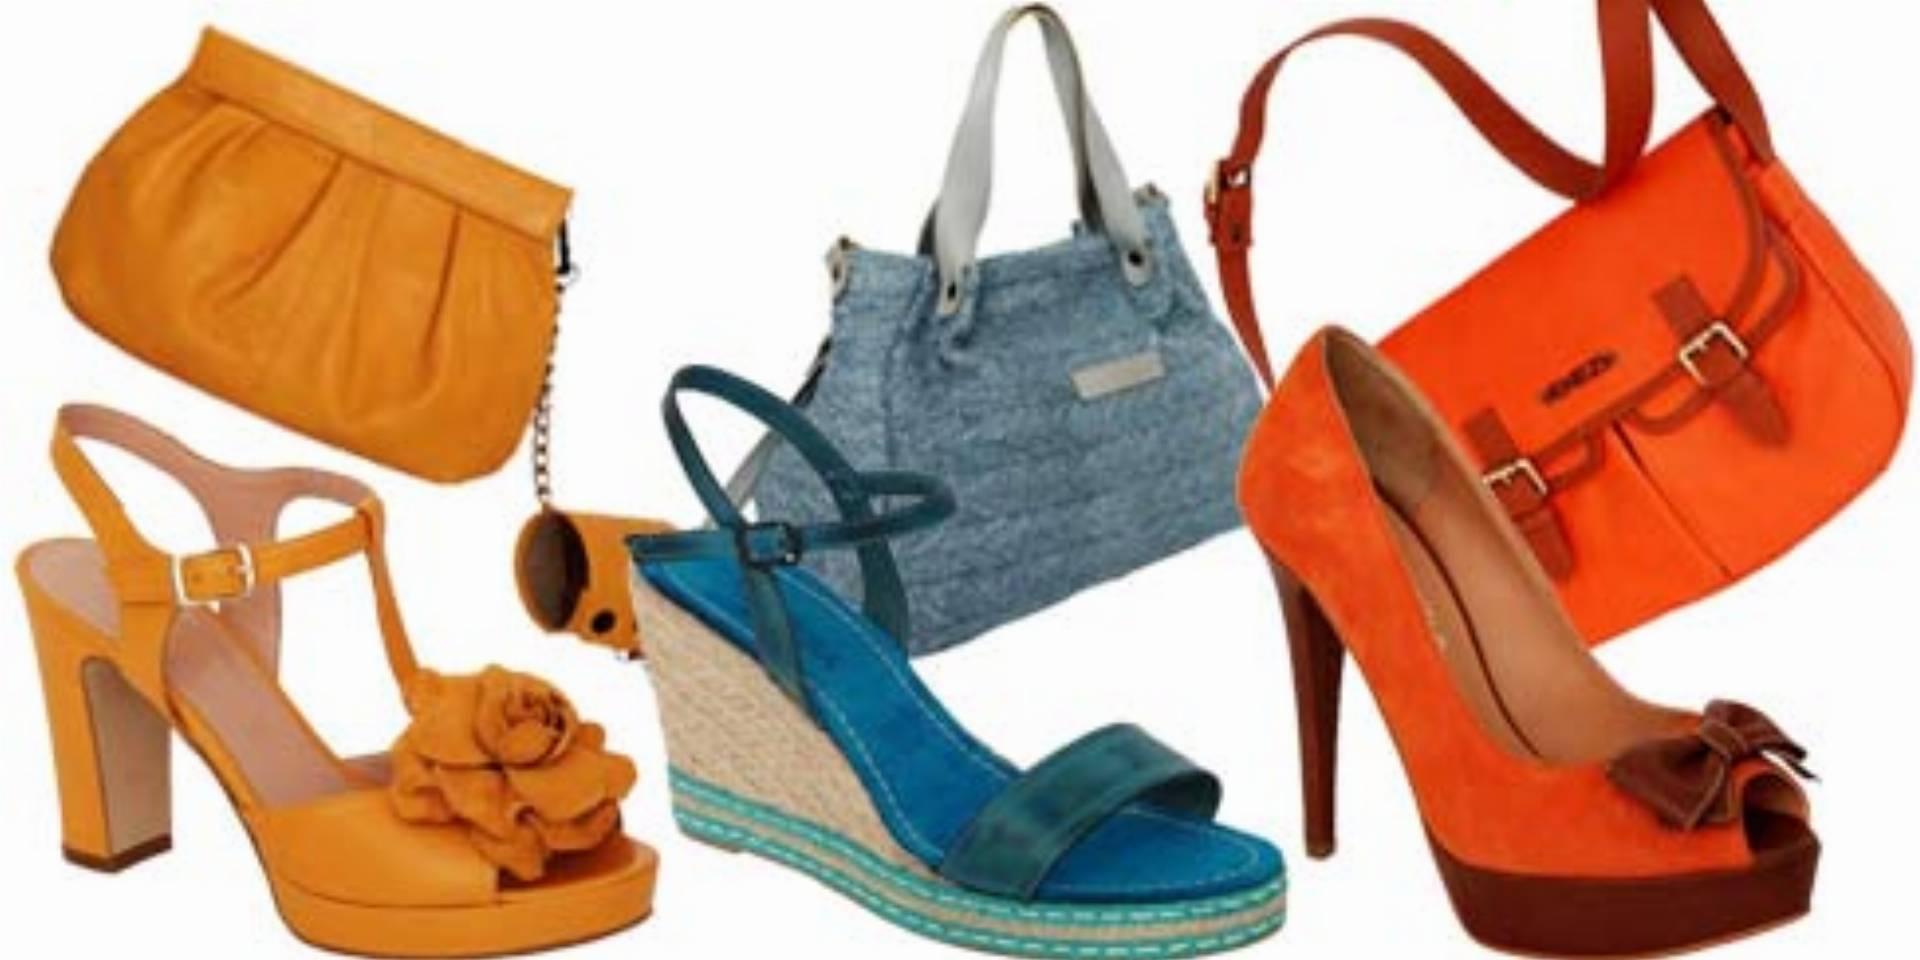 vanezia buty kolekcja wiosna lato 2012